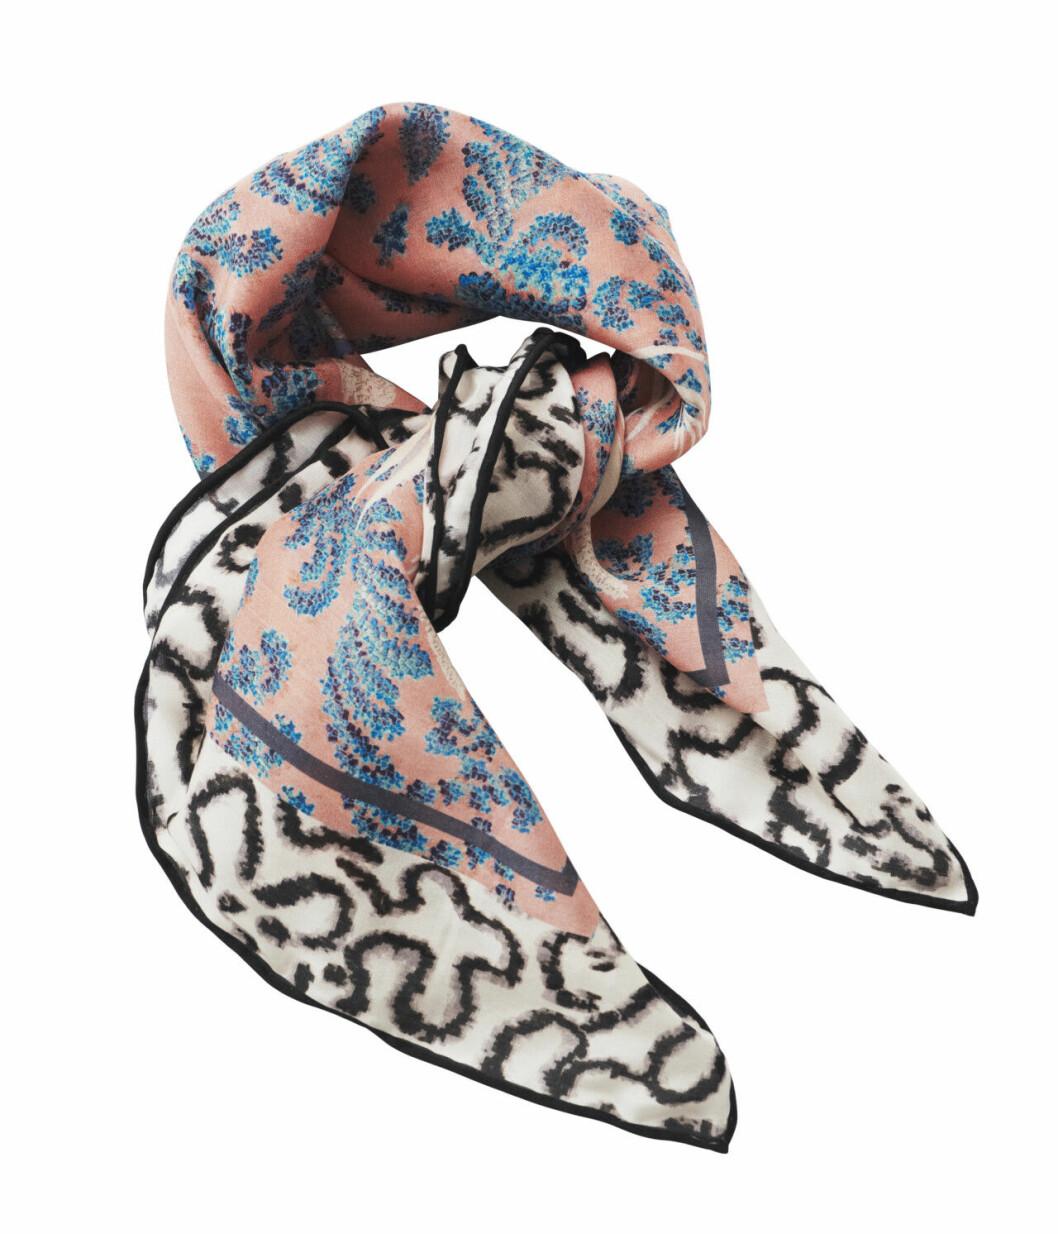 H&M Conscious Exclusive 2019 rosa och svart scarf